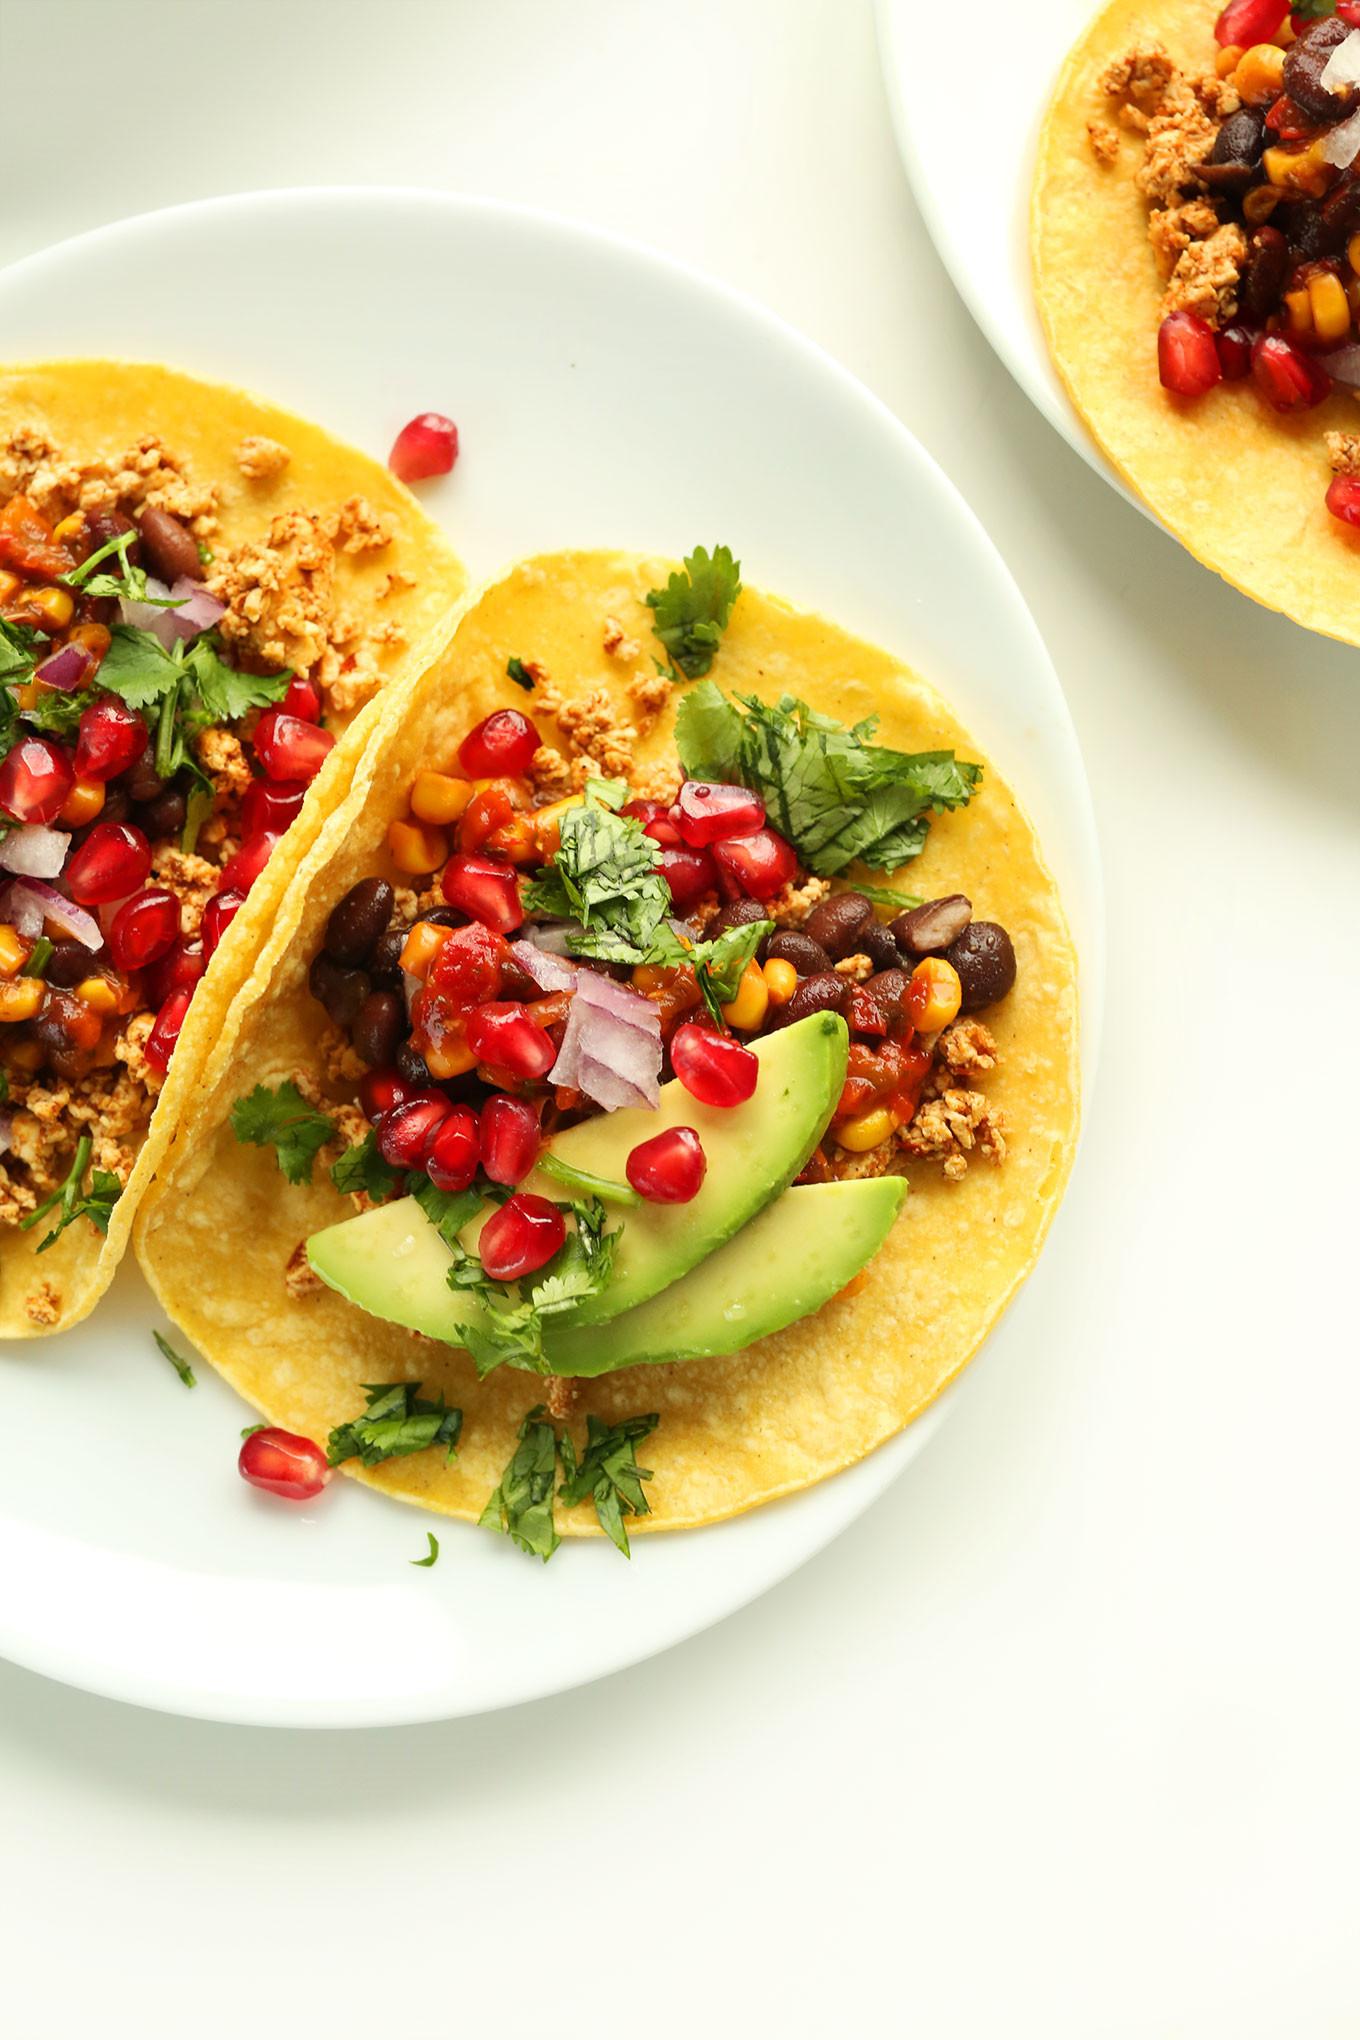 Healthy Vegetarian Breakfast Ideas  Vegan Breakfast Tacos